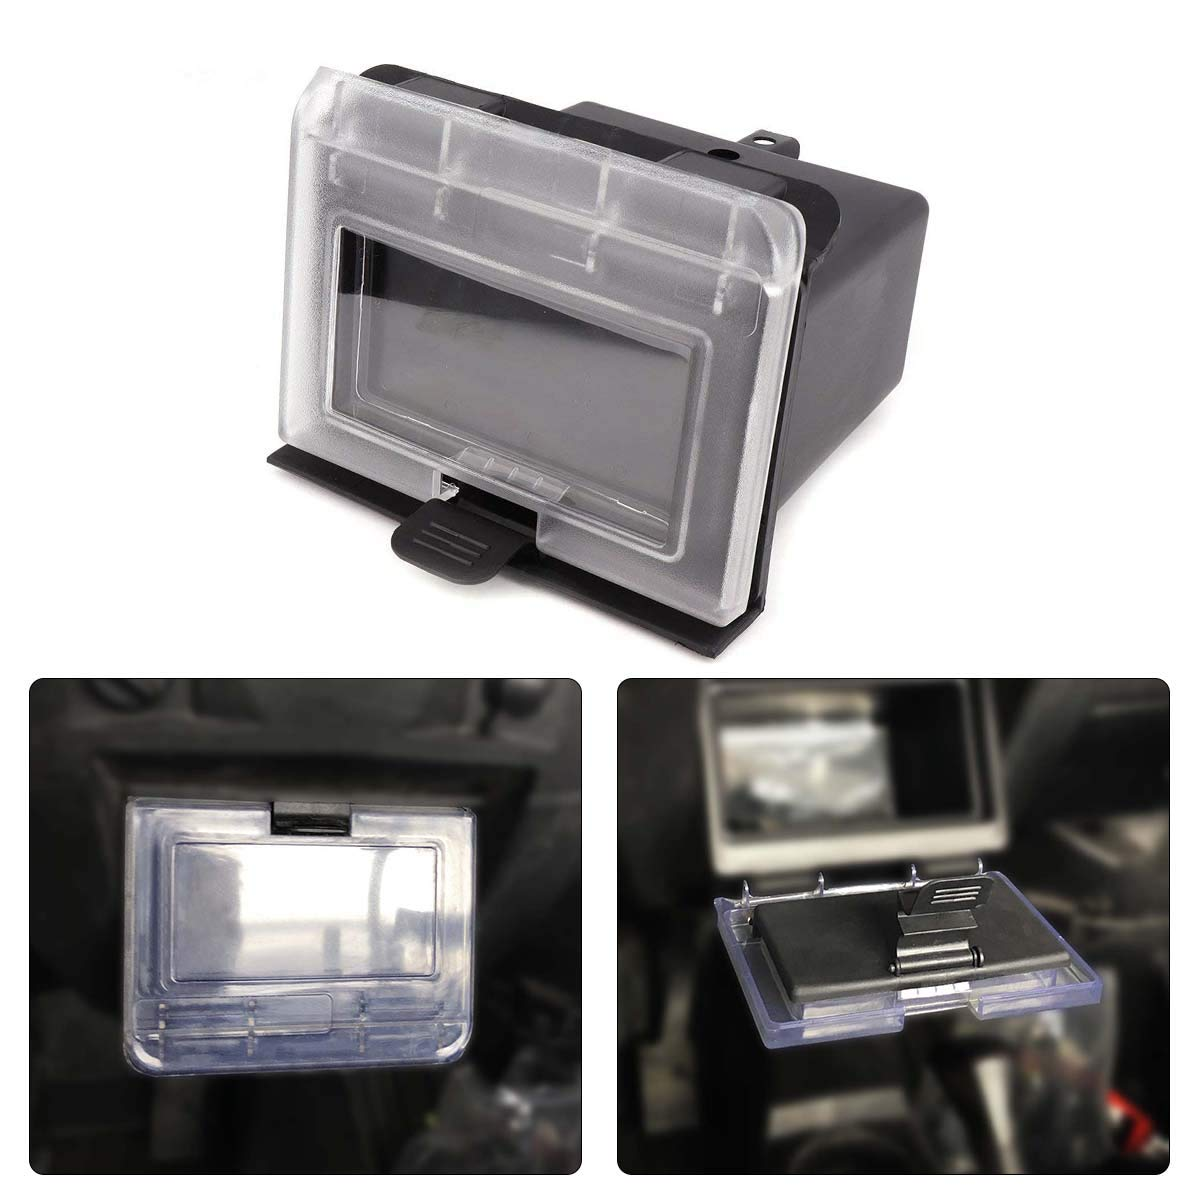 kemimoto RZR Center Dash Storage Box, ABS Center Compartment for Polaris RZR 1000 900S 2014-2018